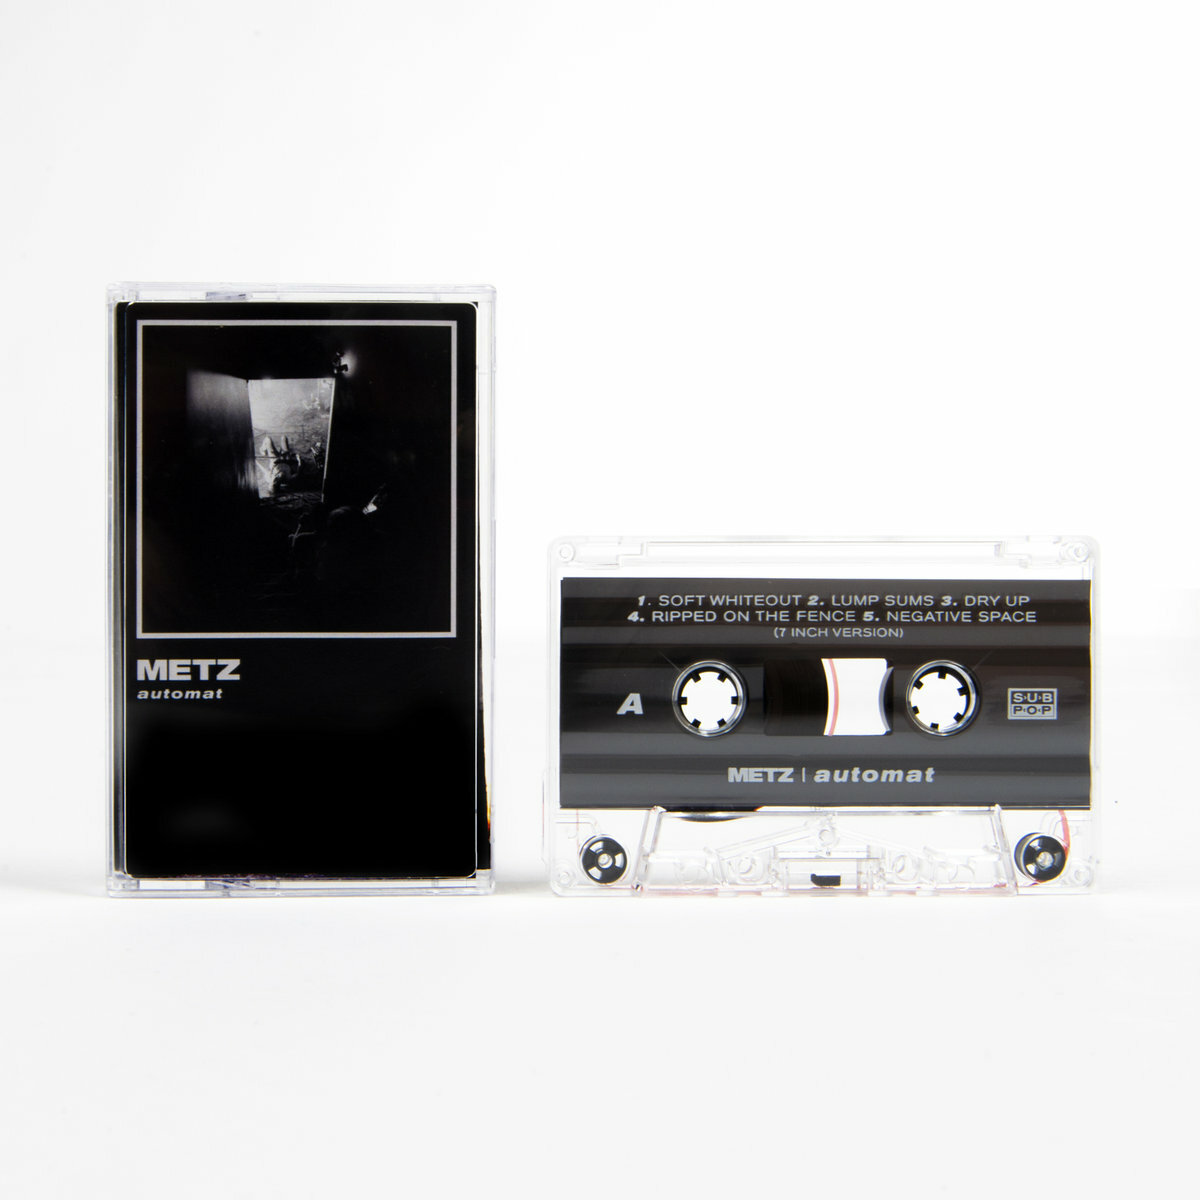 Metz / Automat(Cassette)